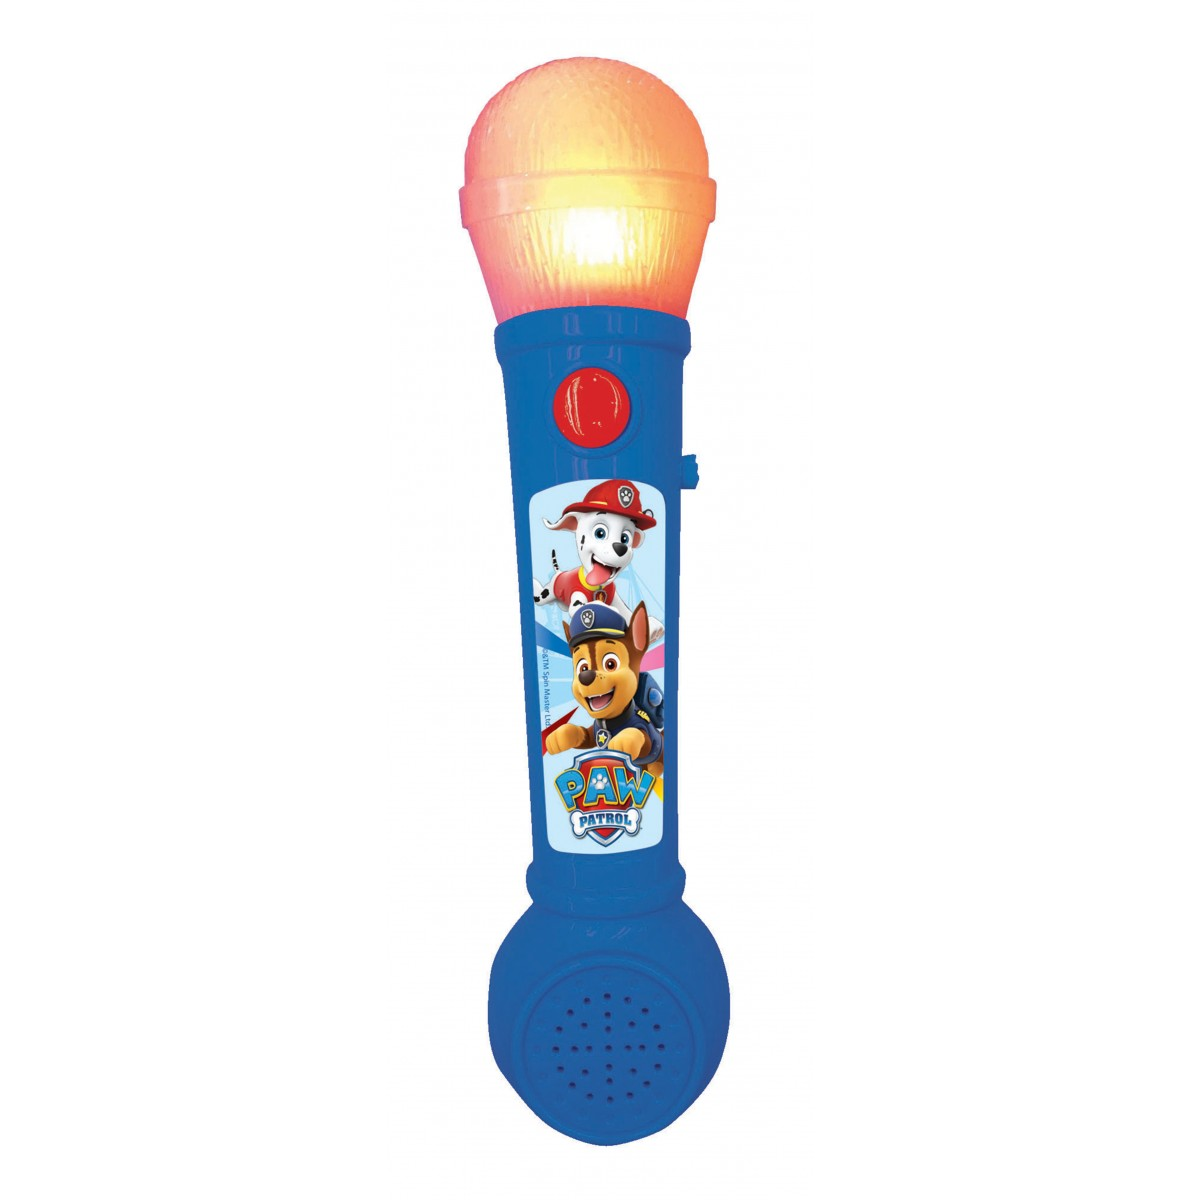 Paw Patrol Microfono Luminoso per bambini